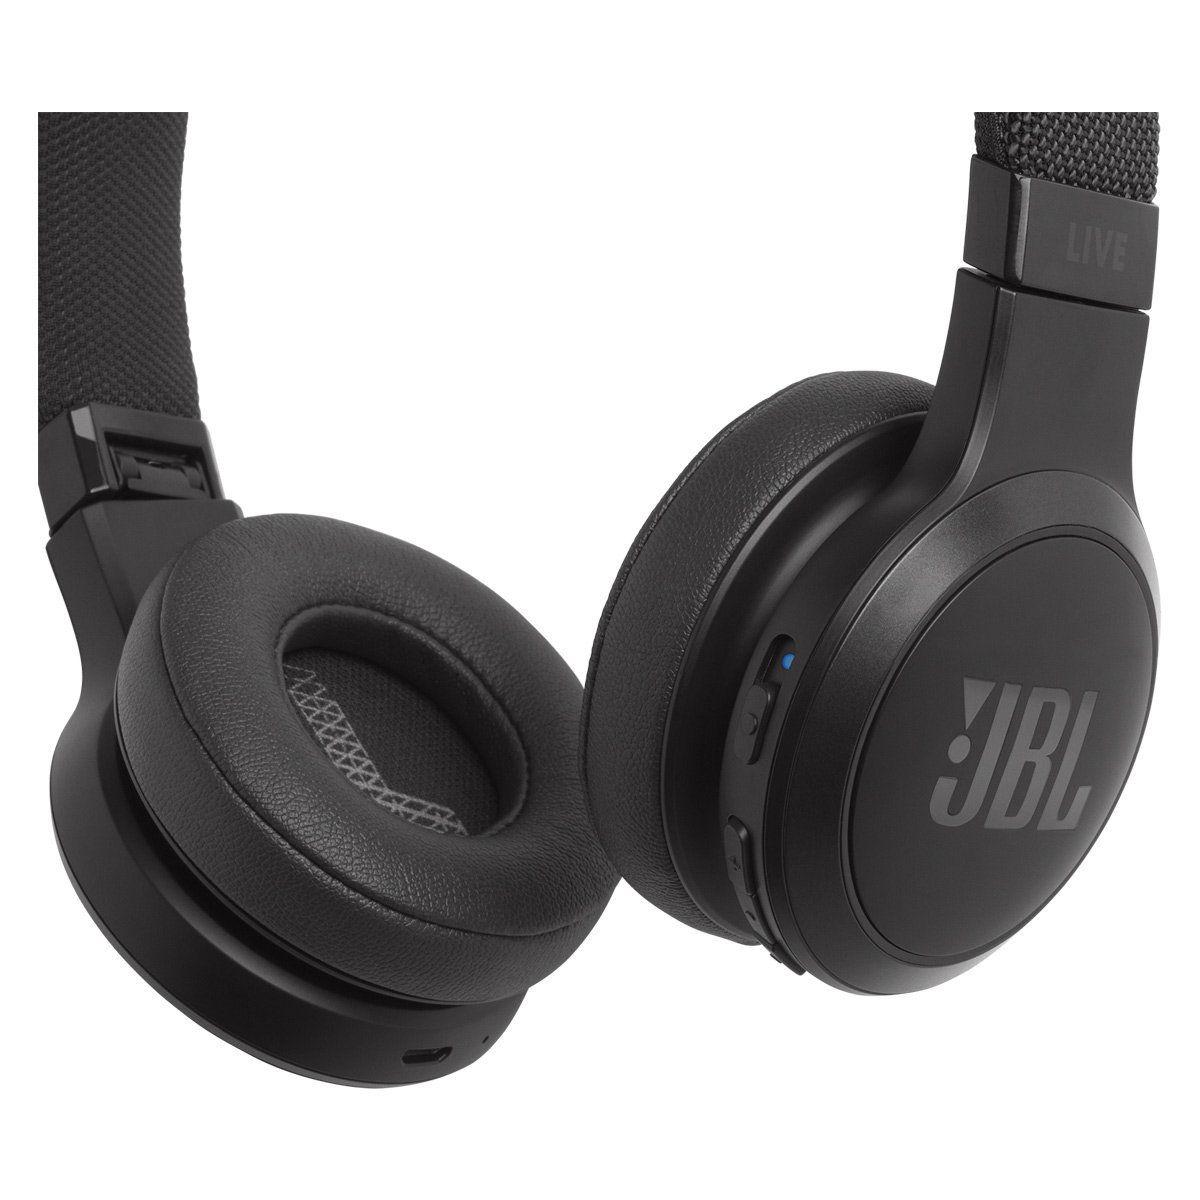 Fone de ouvido Bluetooth JBL LIVE 400BT